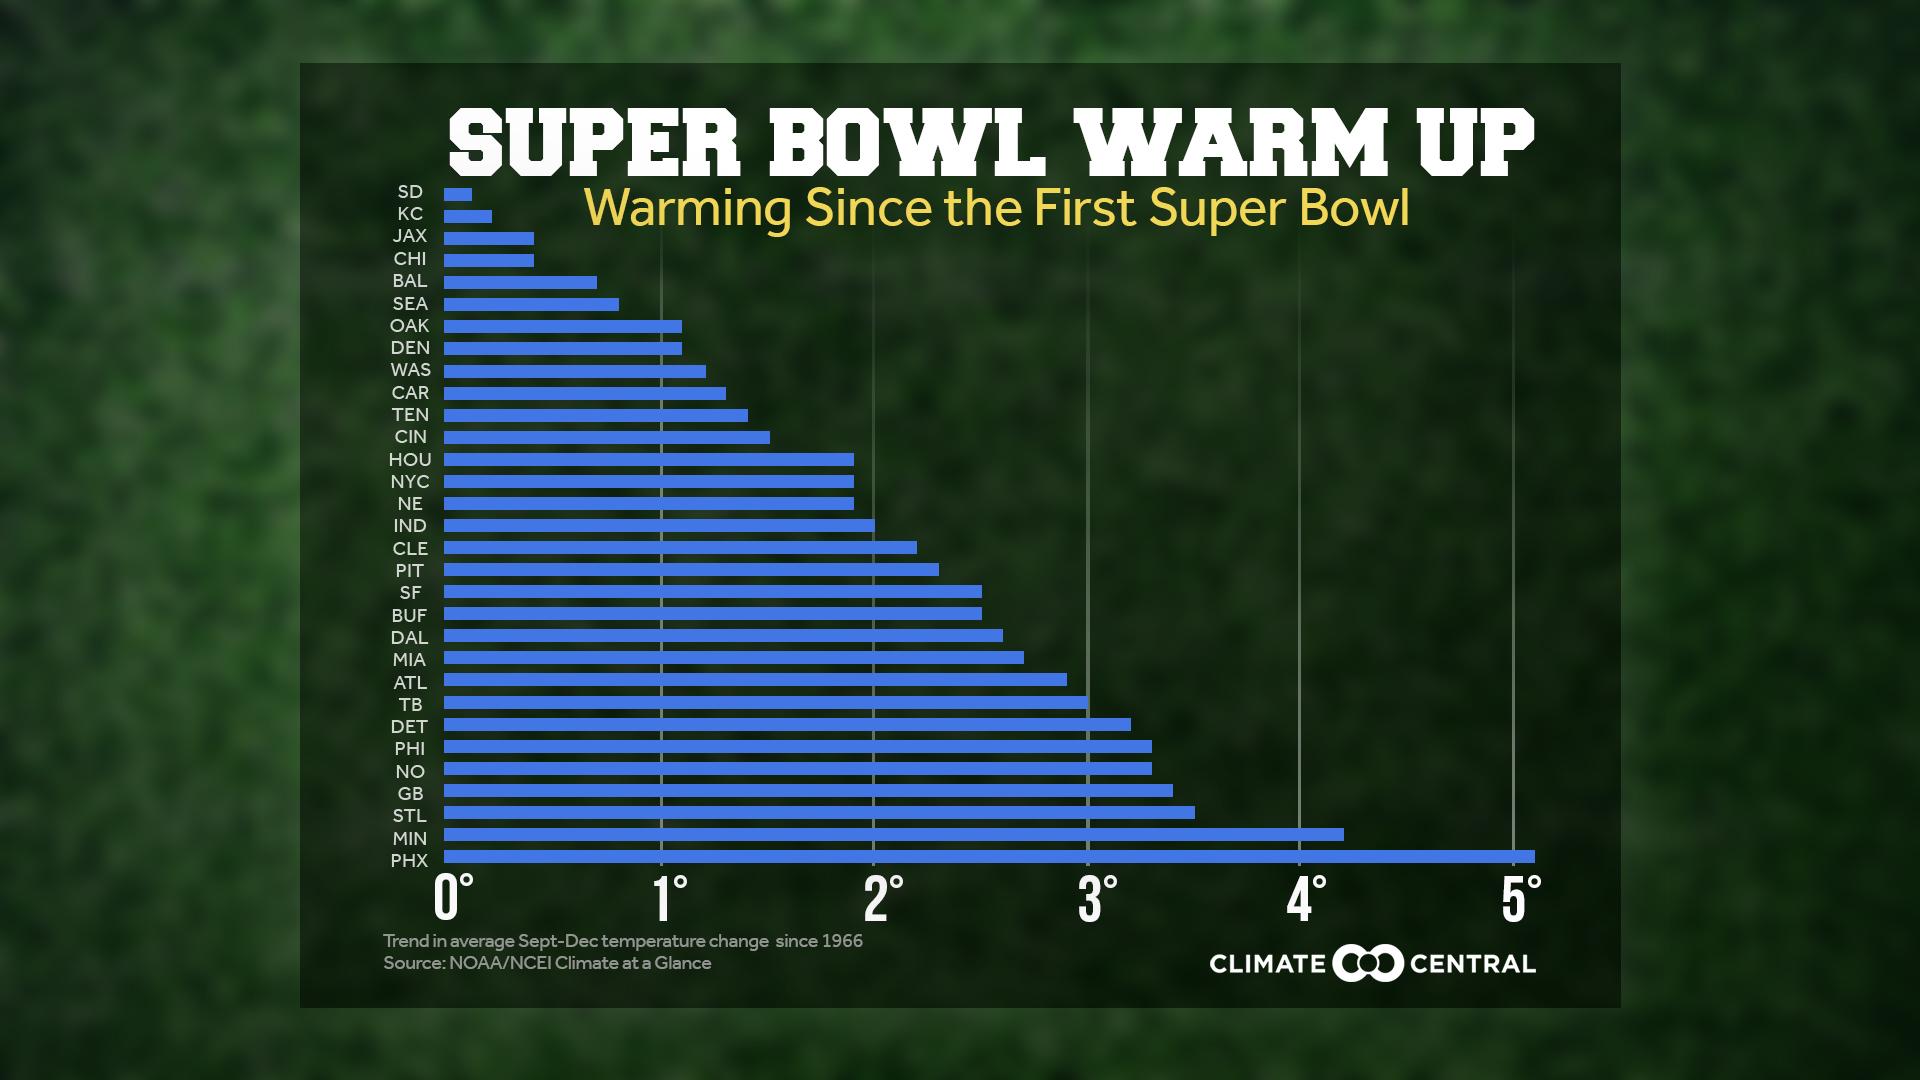 Super Bowl Warming Trends